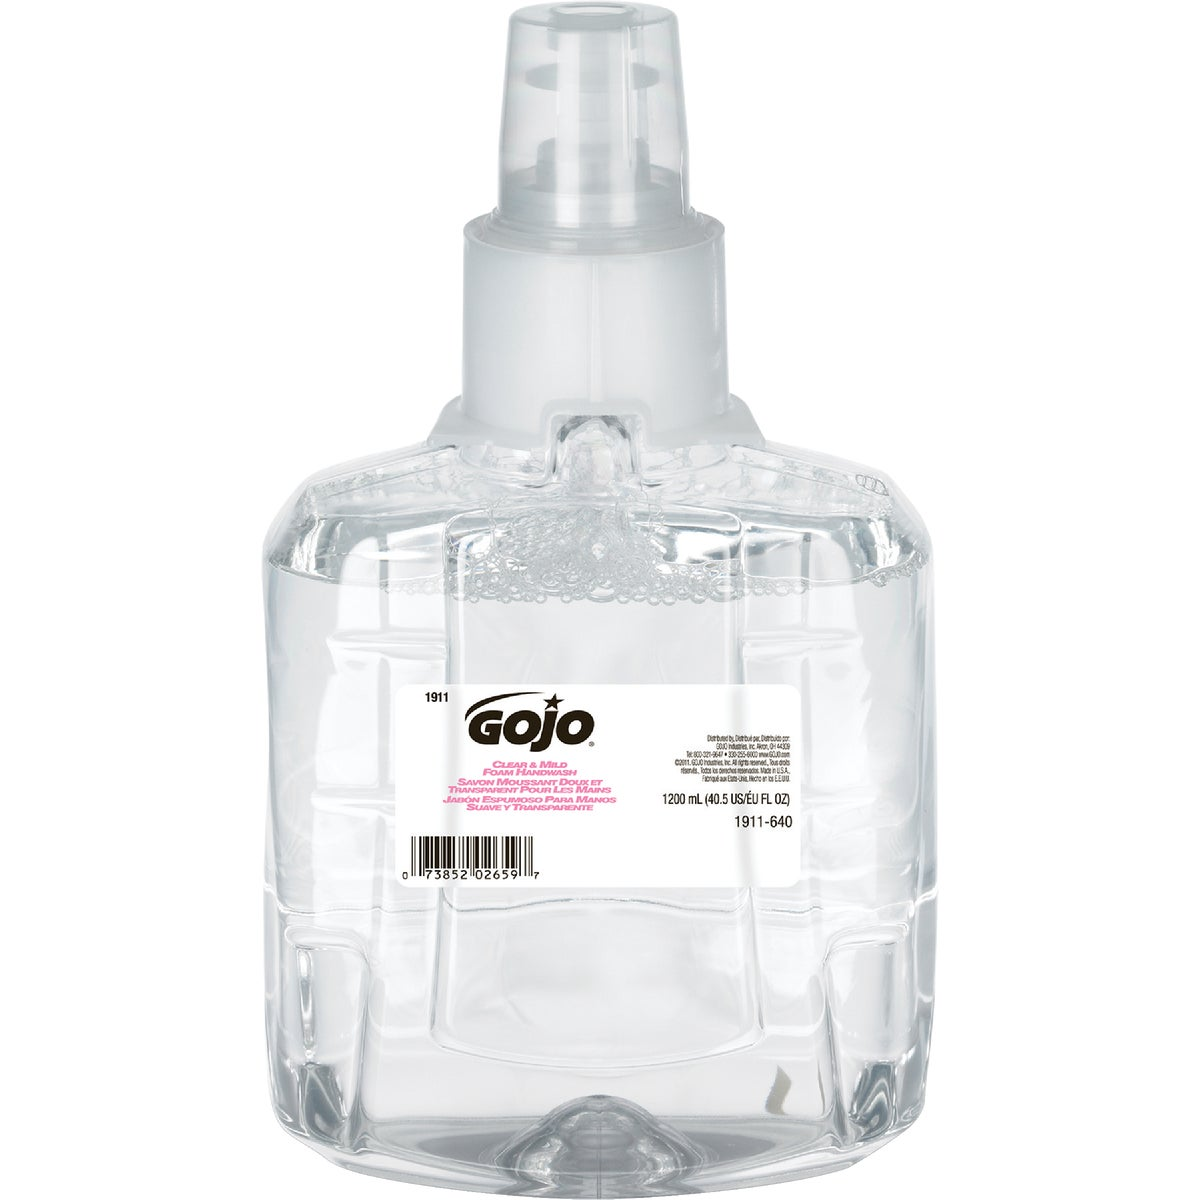 TOUCHLESS MILD FOAM SOAP - 75000149 by Bunzl USA